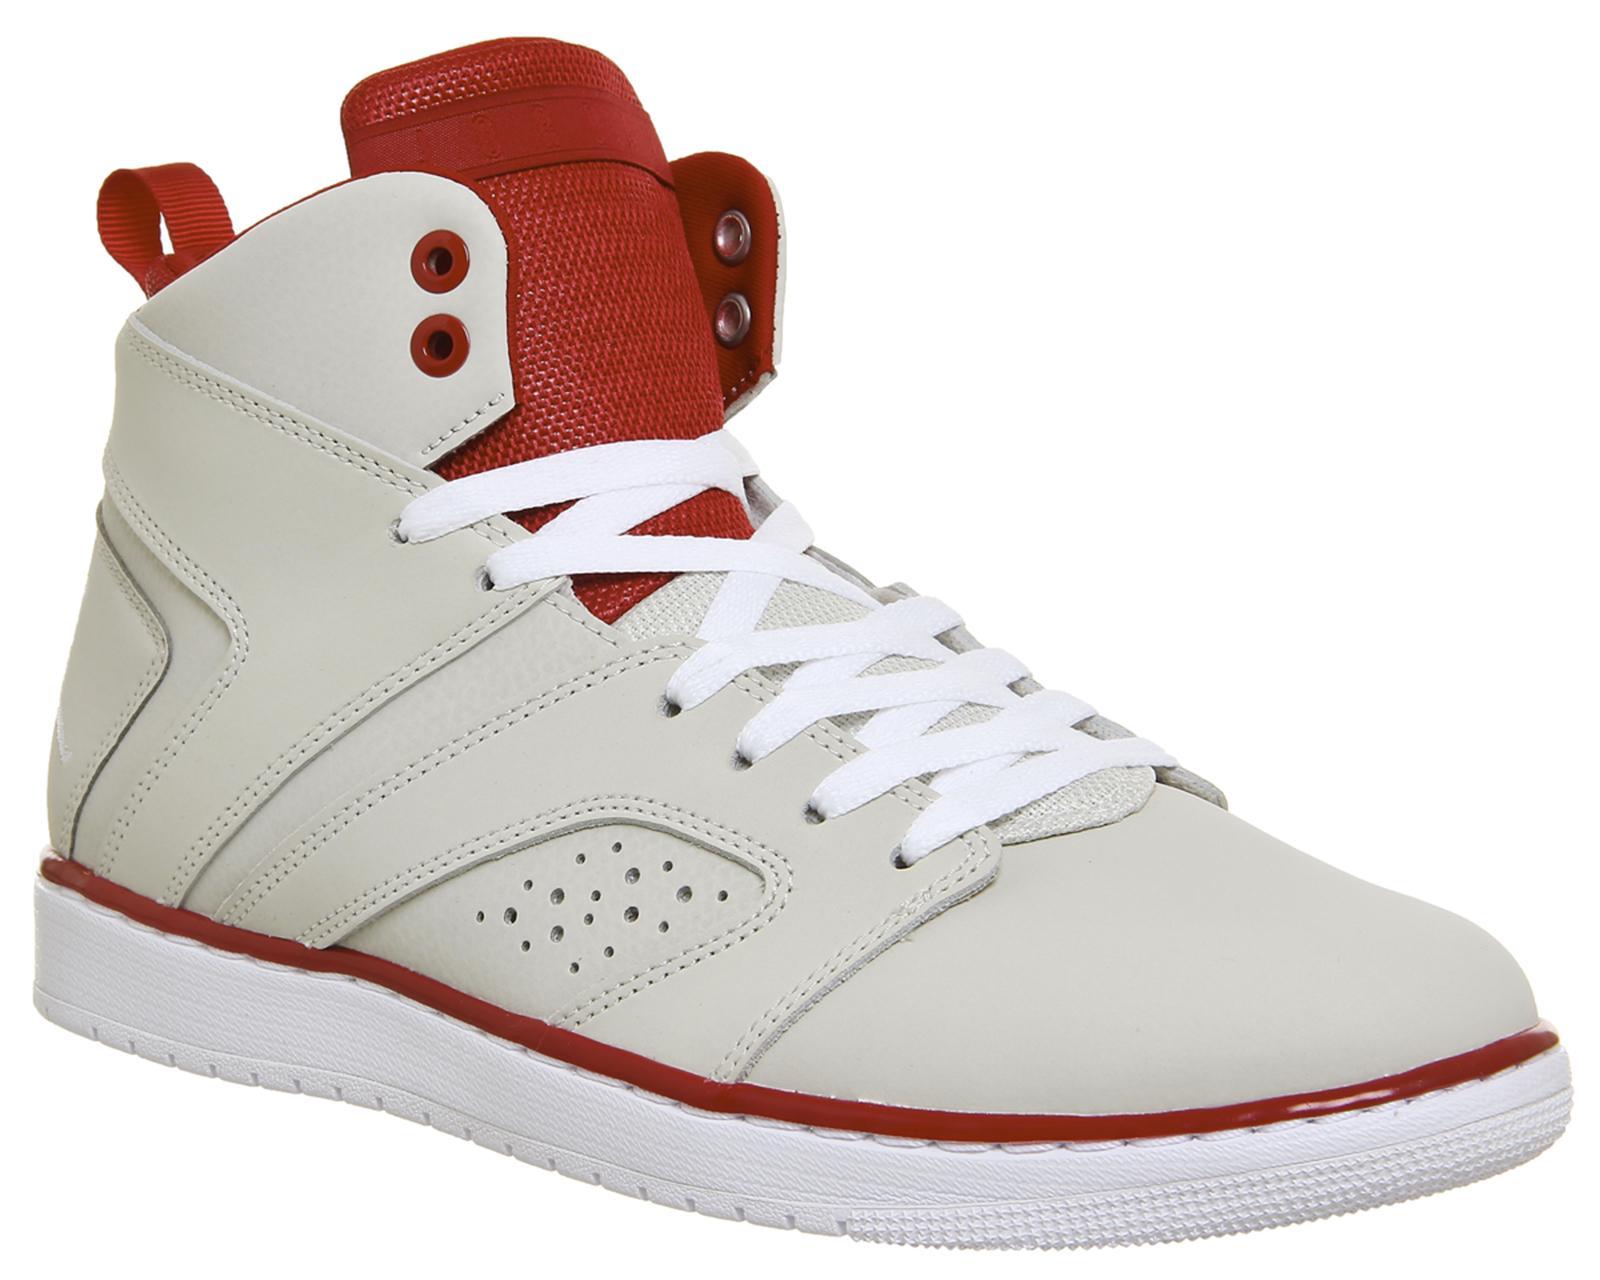 Lyst - Nike Jordan Flight Legend in White for Men a76039f8d